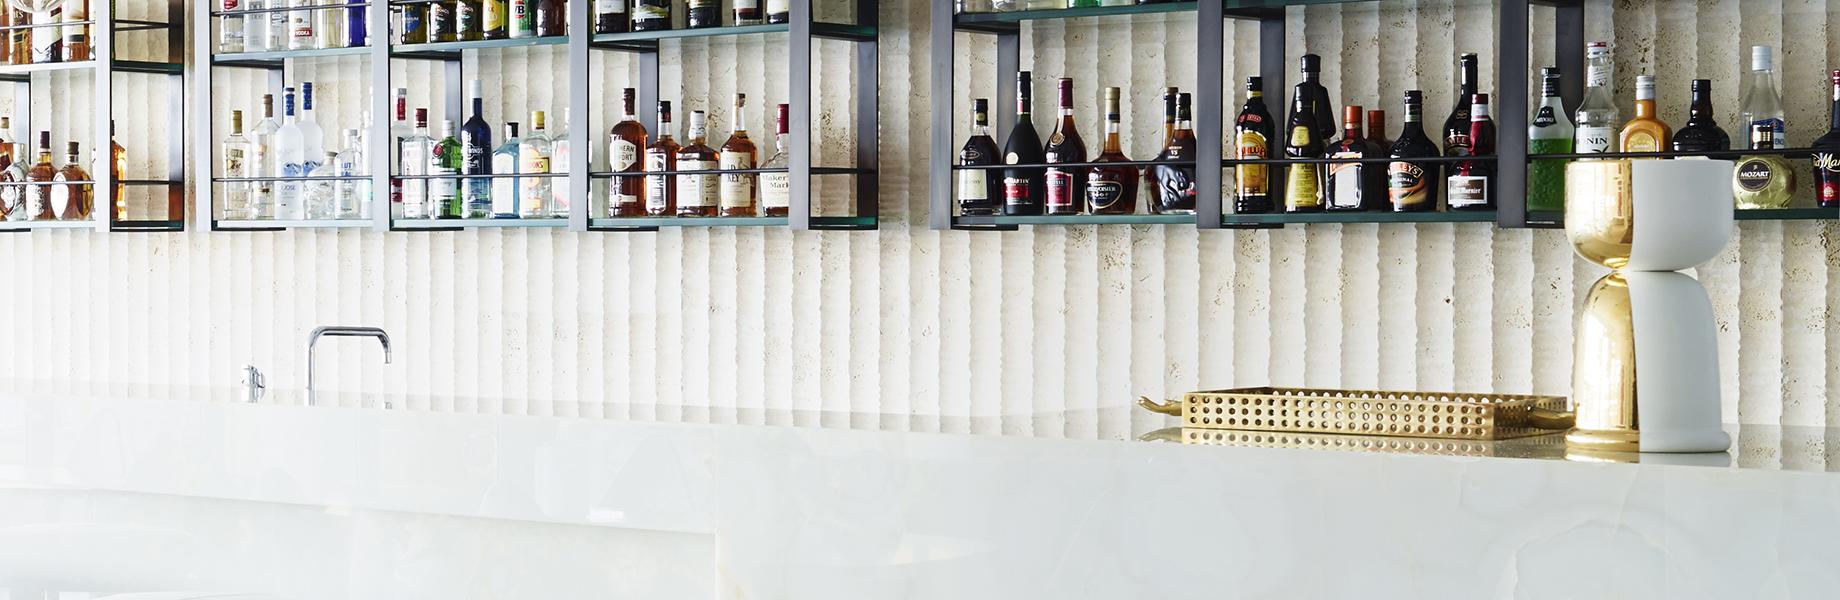 LithosDesign_Tratto revestimiento mural de mármol